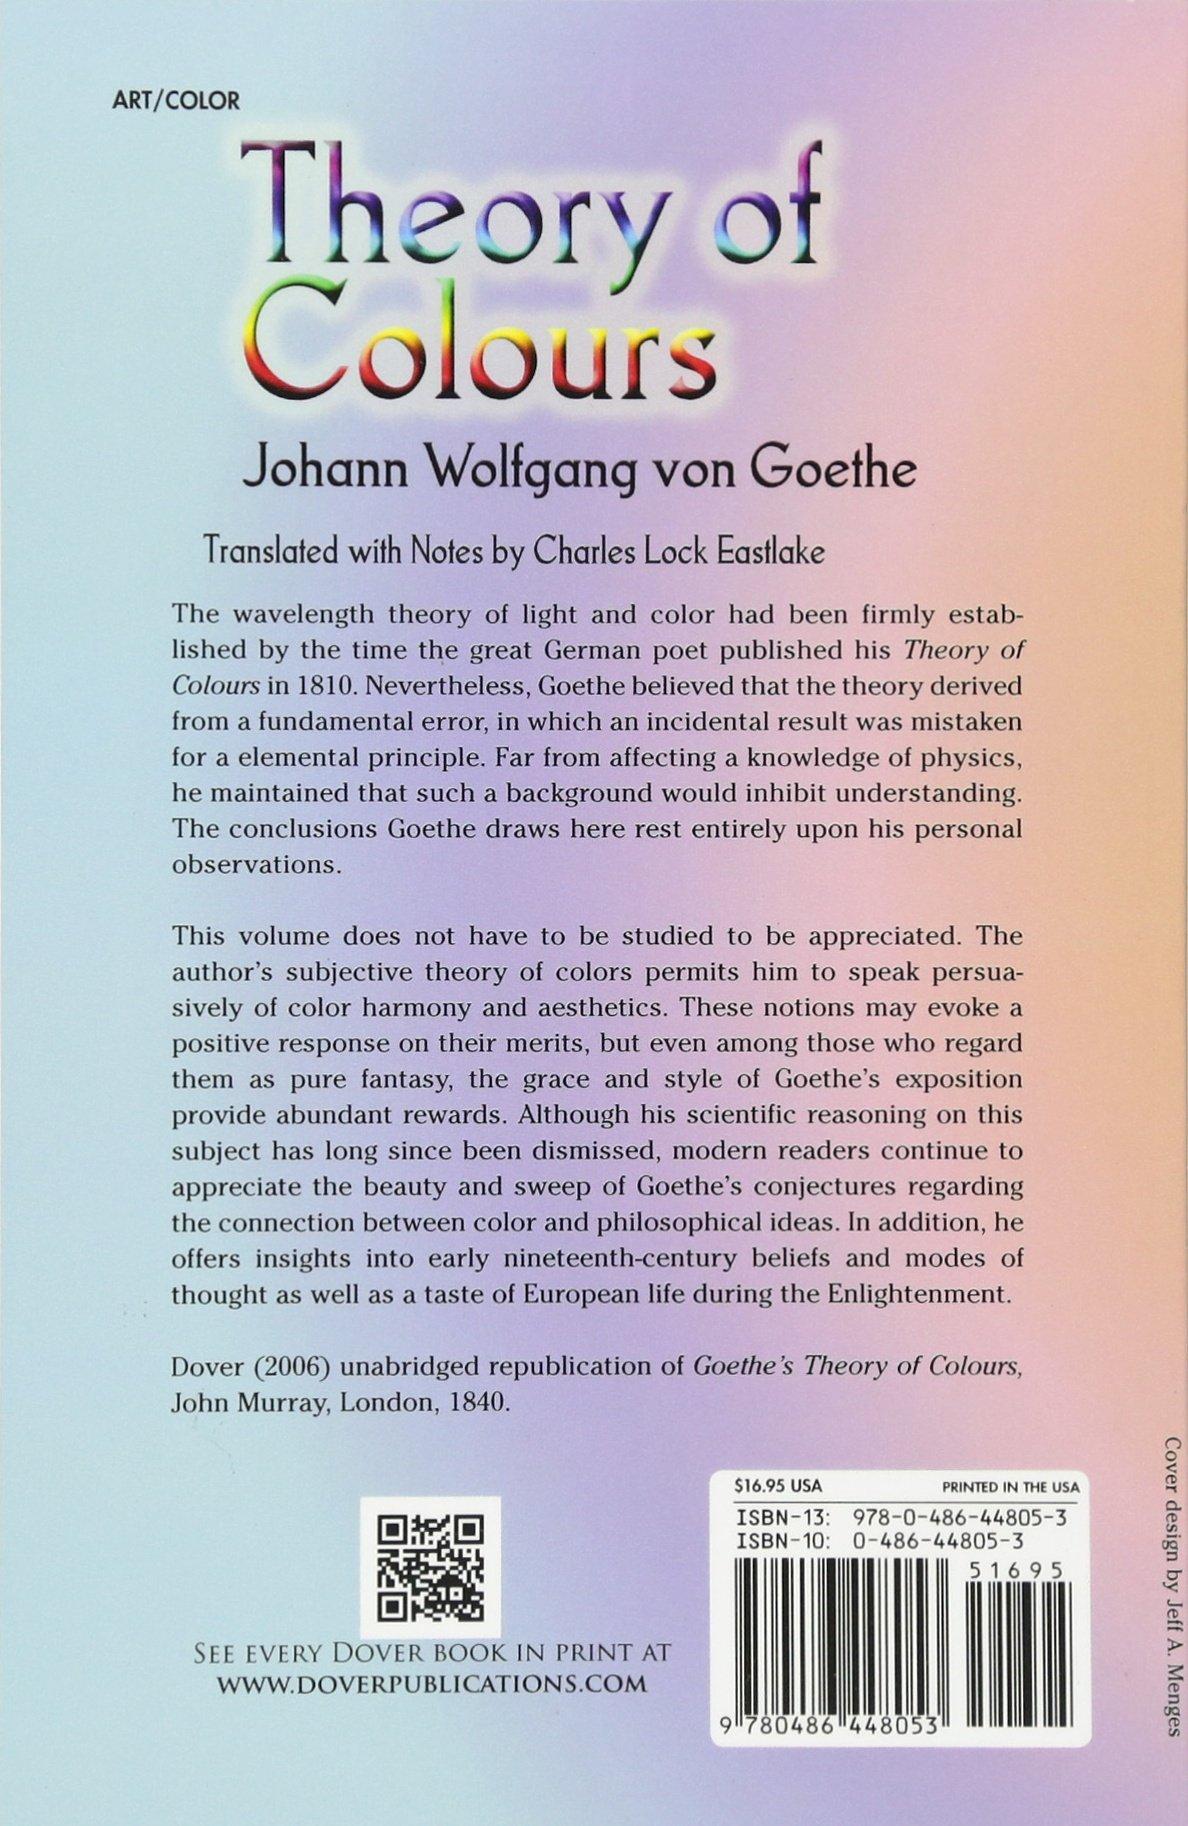 Theory of Colours (Dover Fine Art, History of Art): Johann Wolfgang von  Goethe, Charles L. Eastlake: 9780486448053: Amazon.com: Books